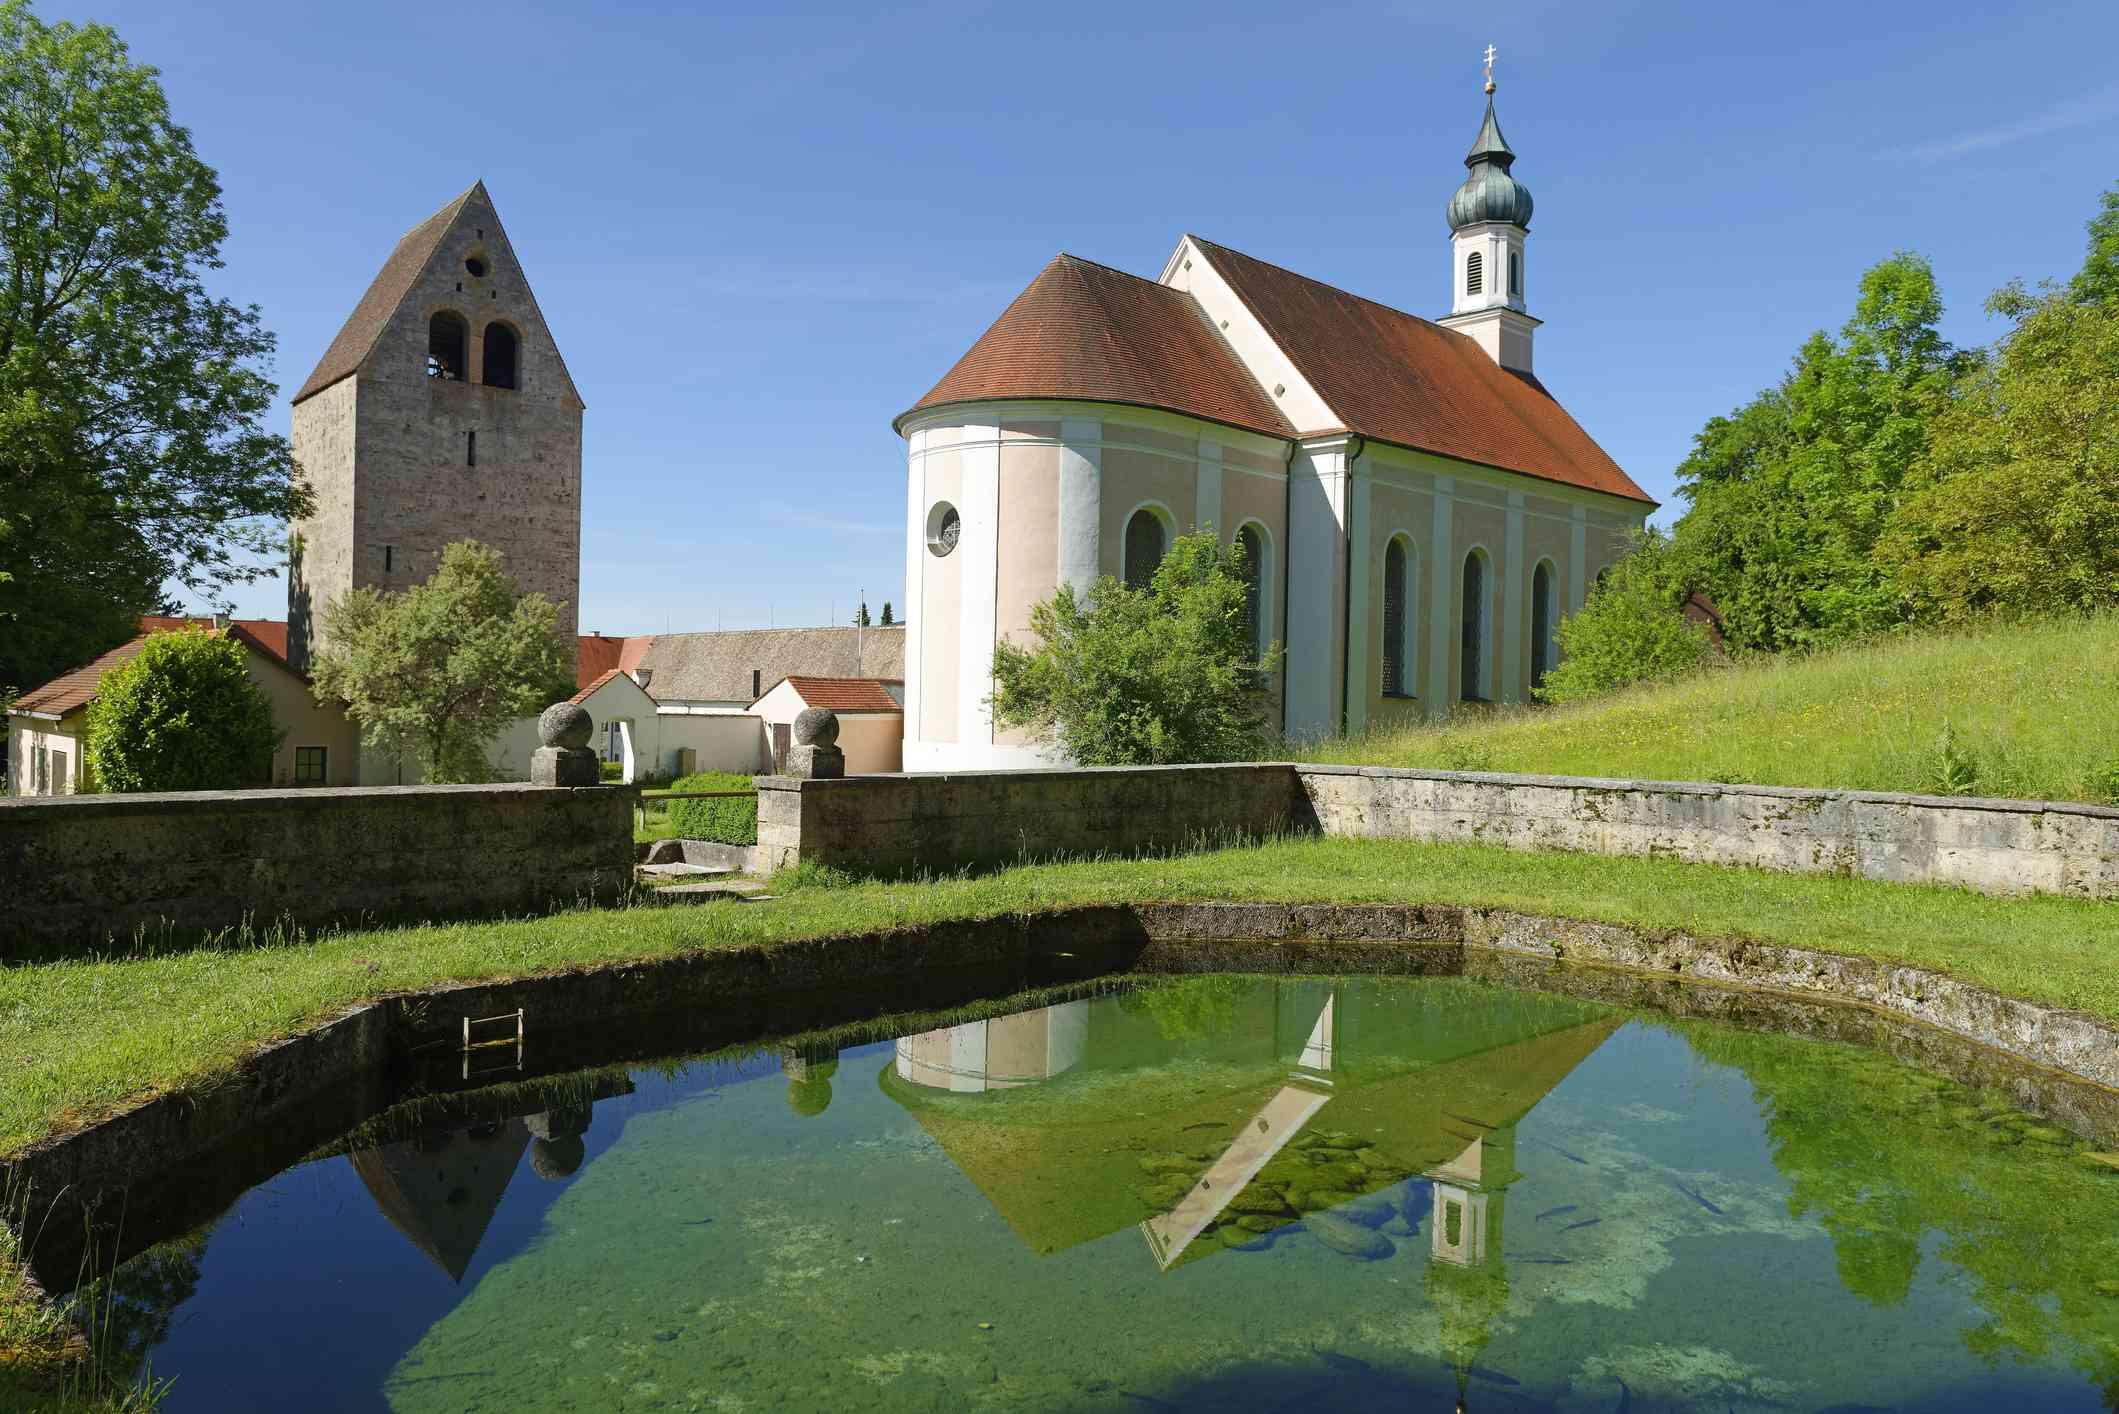 Former monastery Wessobrunn with parish church of St. John Baptist, Wessobrunn, Pfaffenwinkel, Upper Bavaria, Bavaria, Germany